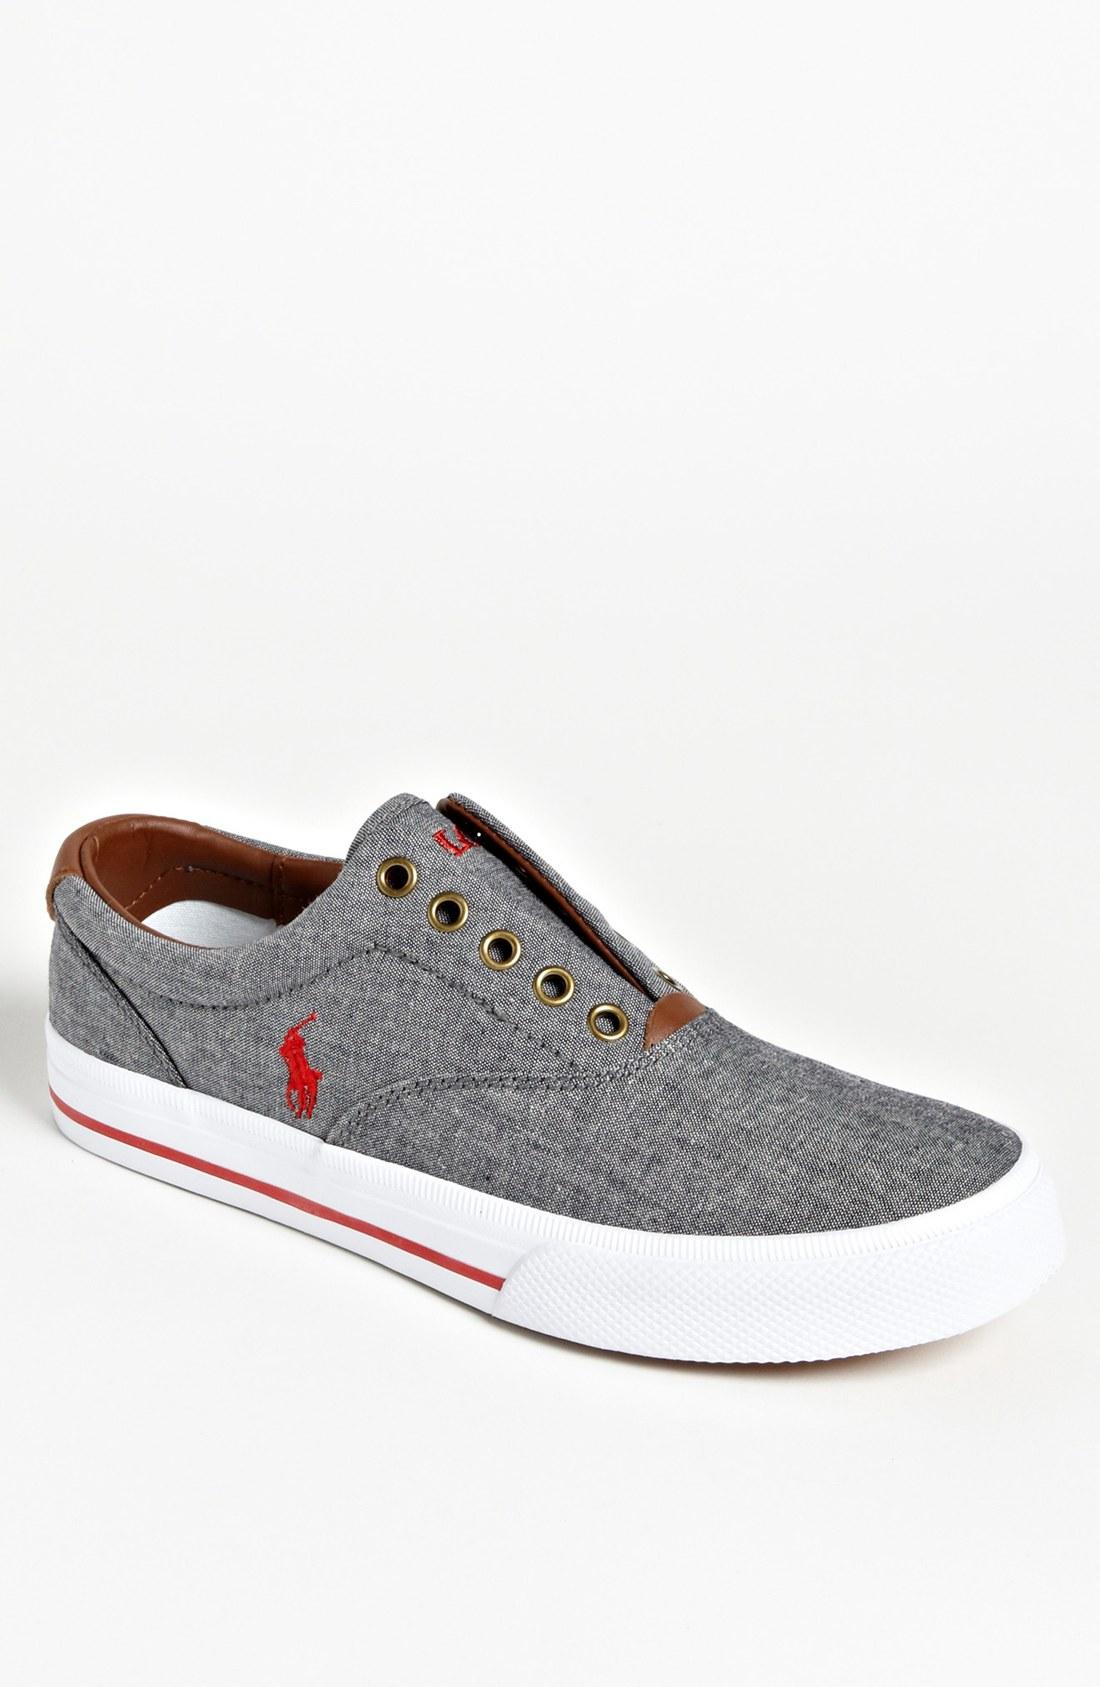 ralph lauren collection polo ralph lauren vito slipon sneaker in gray. Black Bedroom Furniture Sets. Home Design Ideas